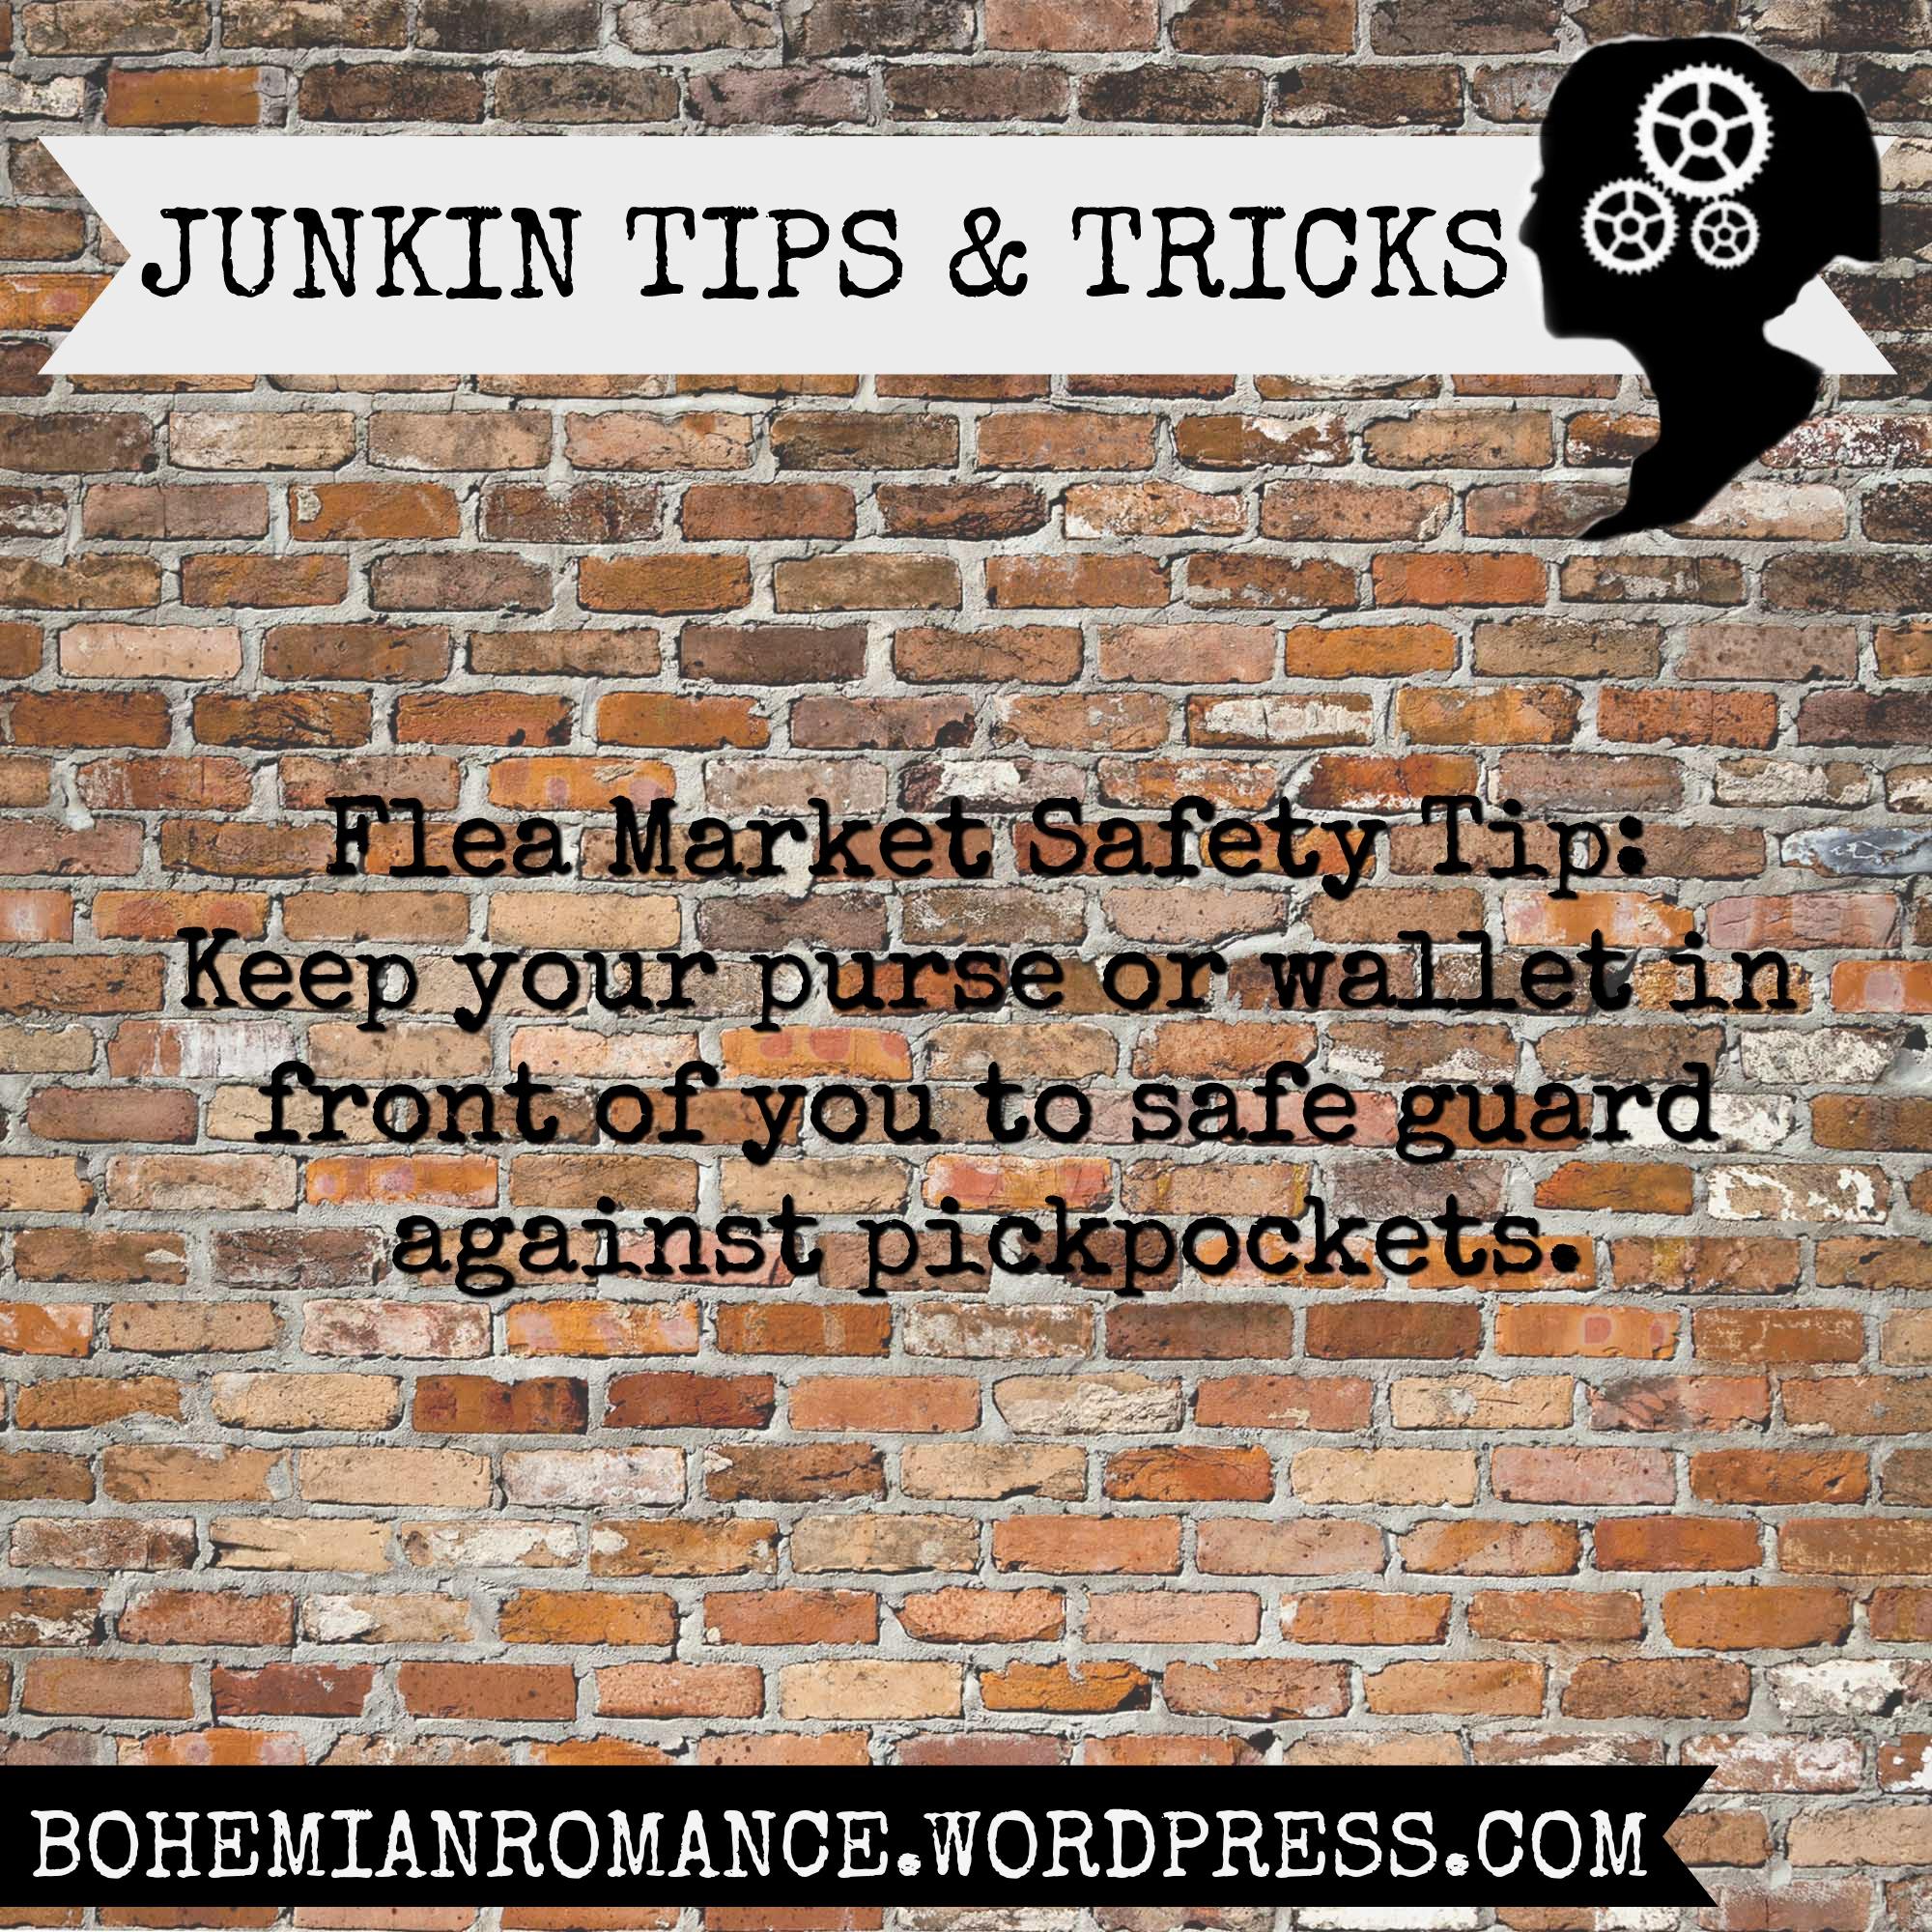 24-junkin-tips-tricks-template